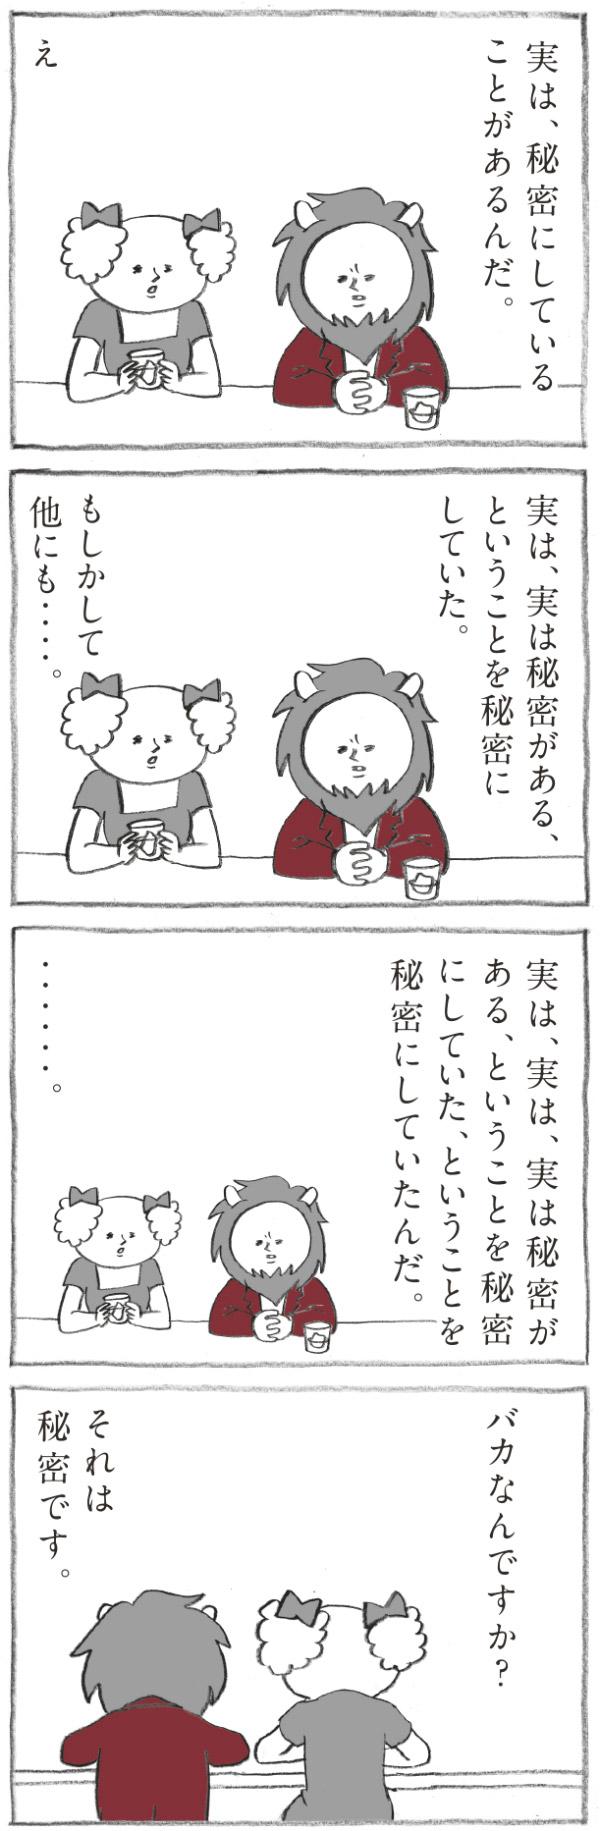 Hanako 1171号:おかわり自由